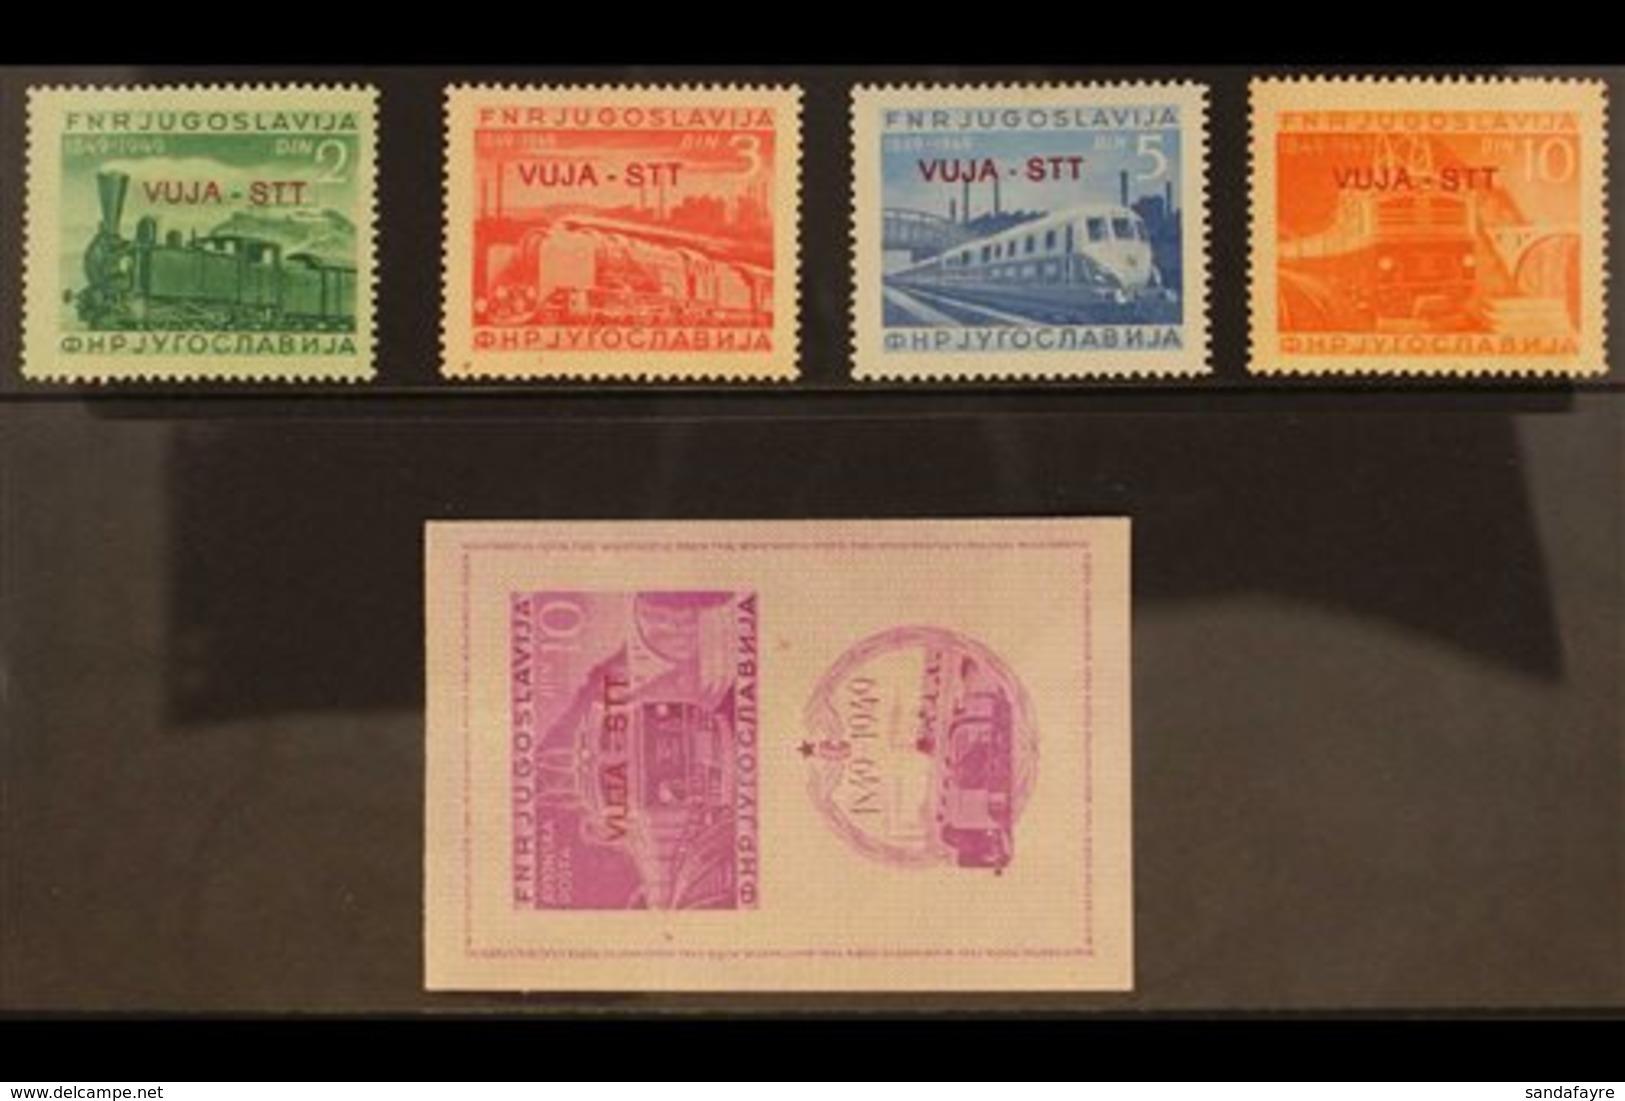 "ZONE B 1950 Railway Centenary Set Plus Imperf Miniature Sheet, Overprinted ""VUJA - STT"" In Red, SG B33/B36 Plus MS B36Ba - 7. Trieste"